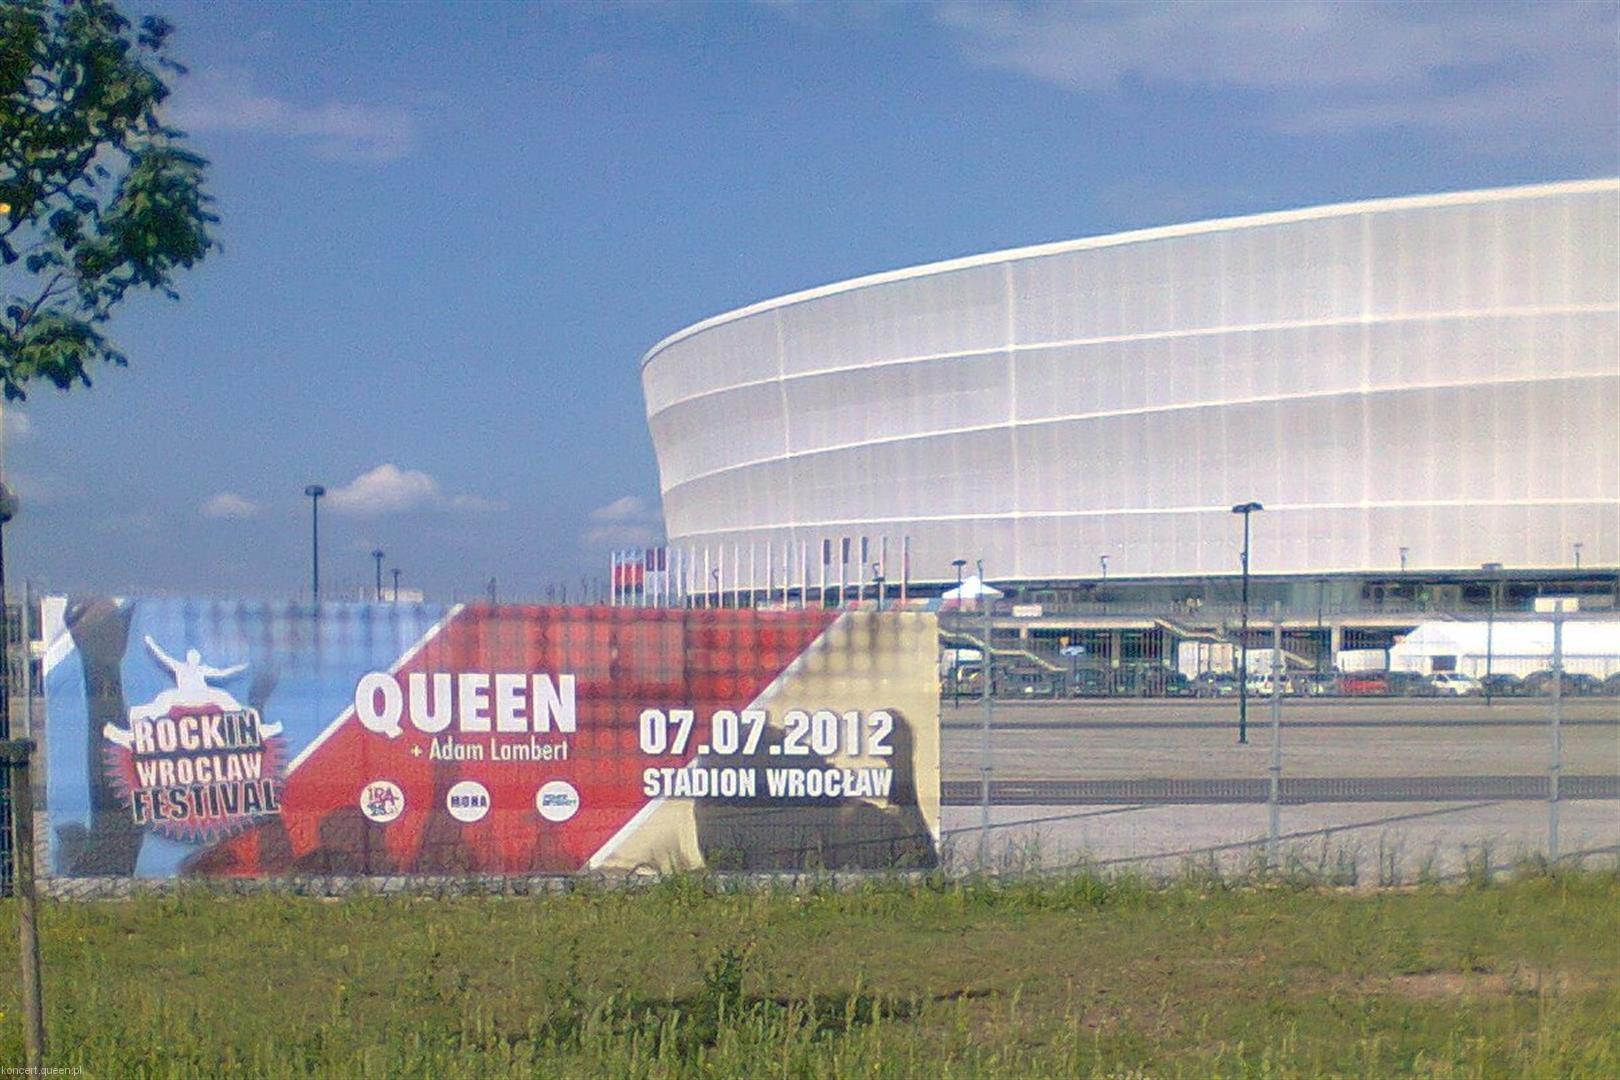 queenadamlambert2012wroclaw rl026